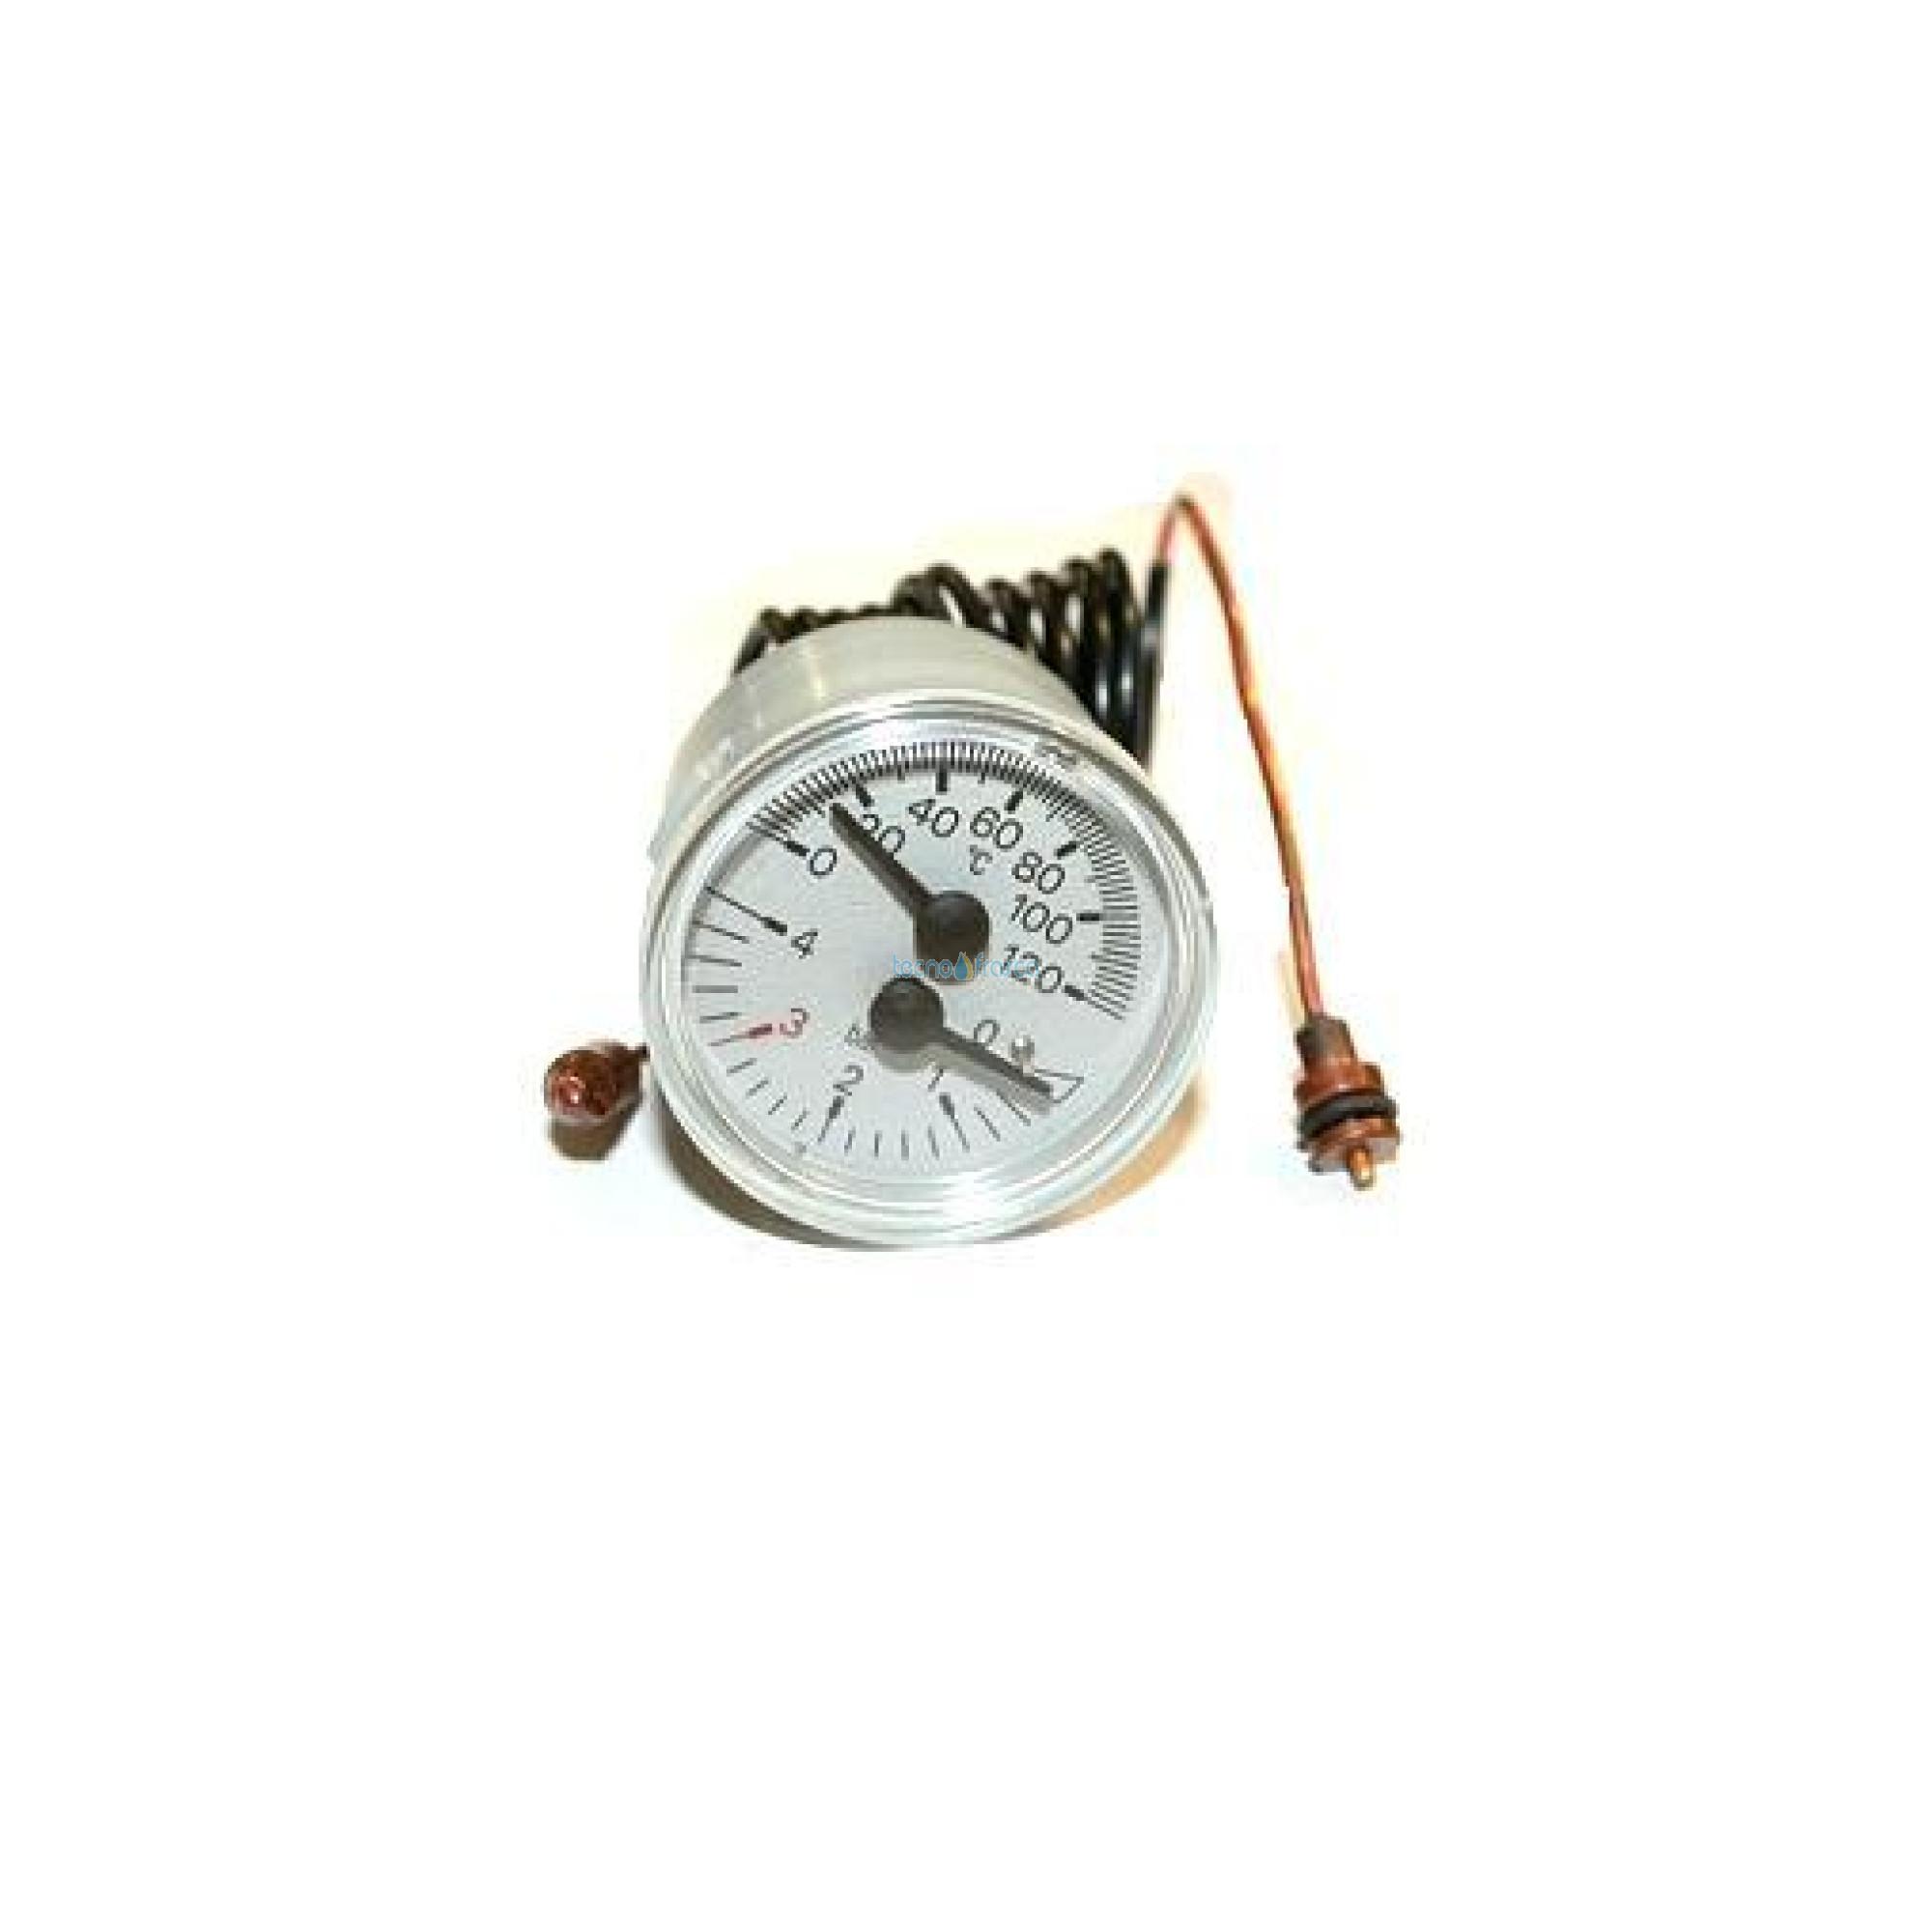 Beretta termoidrometro R10021983